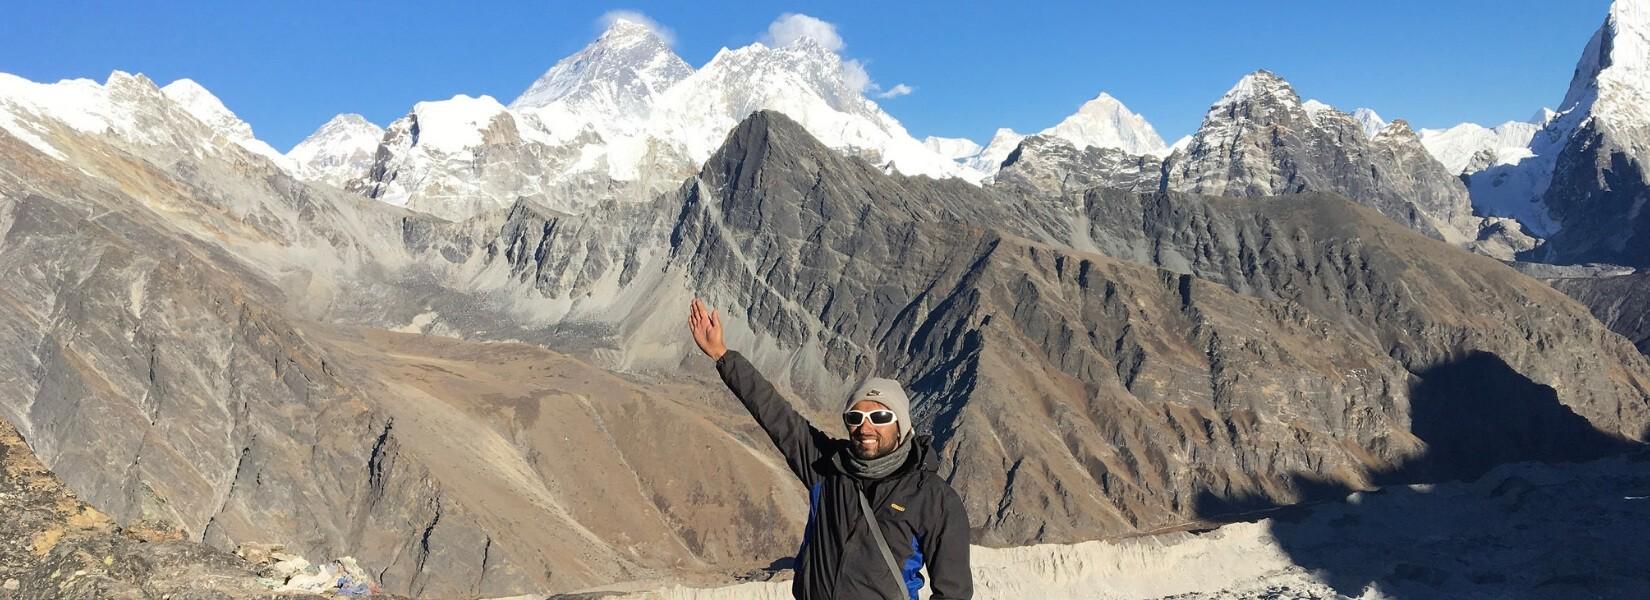 Everest base camp trek itinerary blog